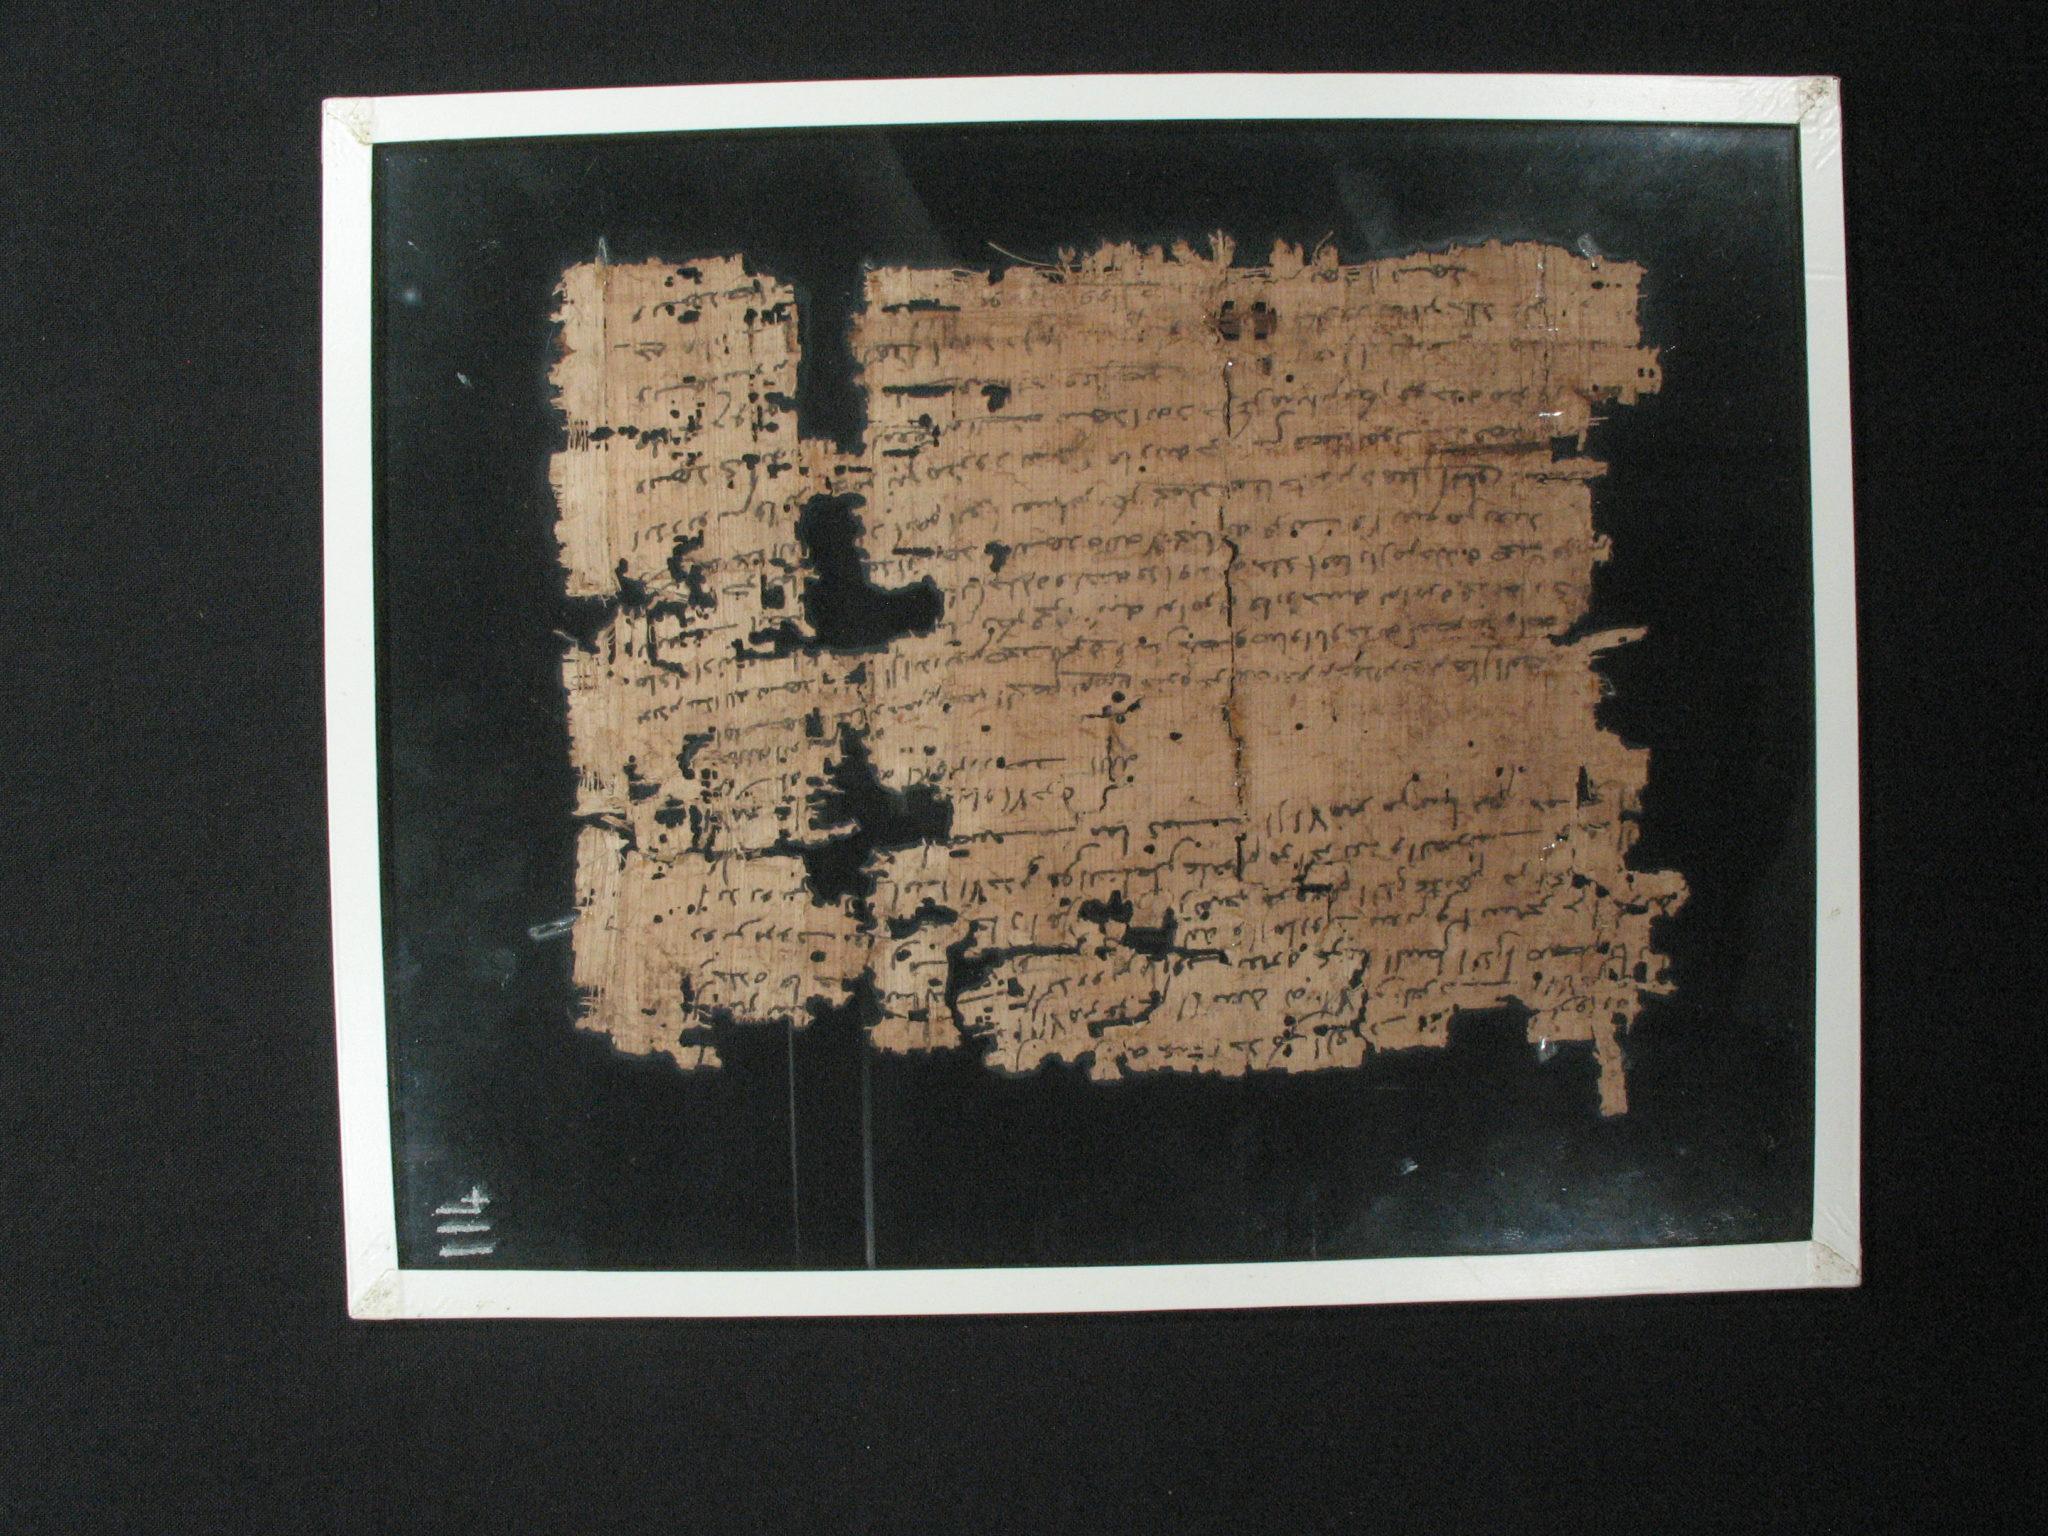 114a - Arabic Papyrus Recto 3